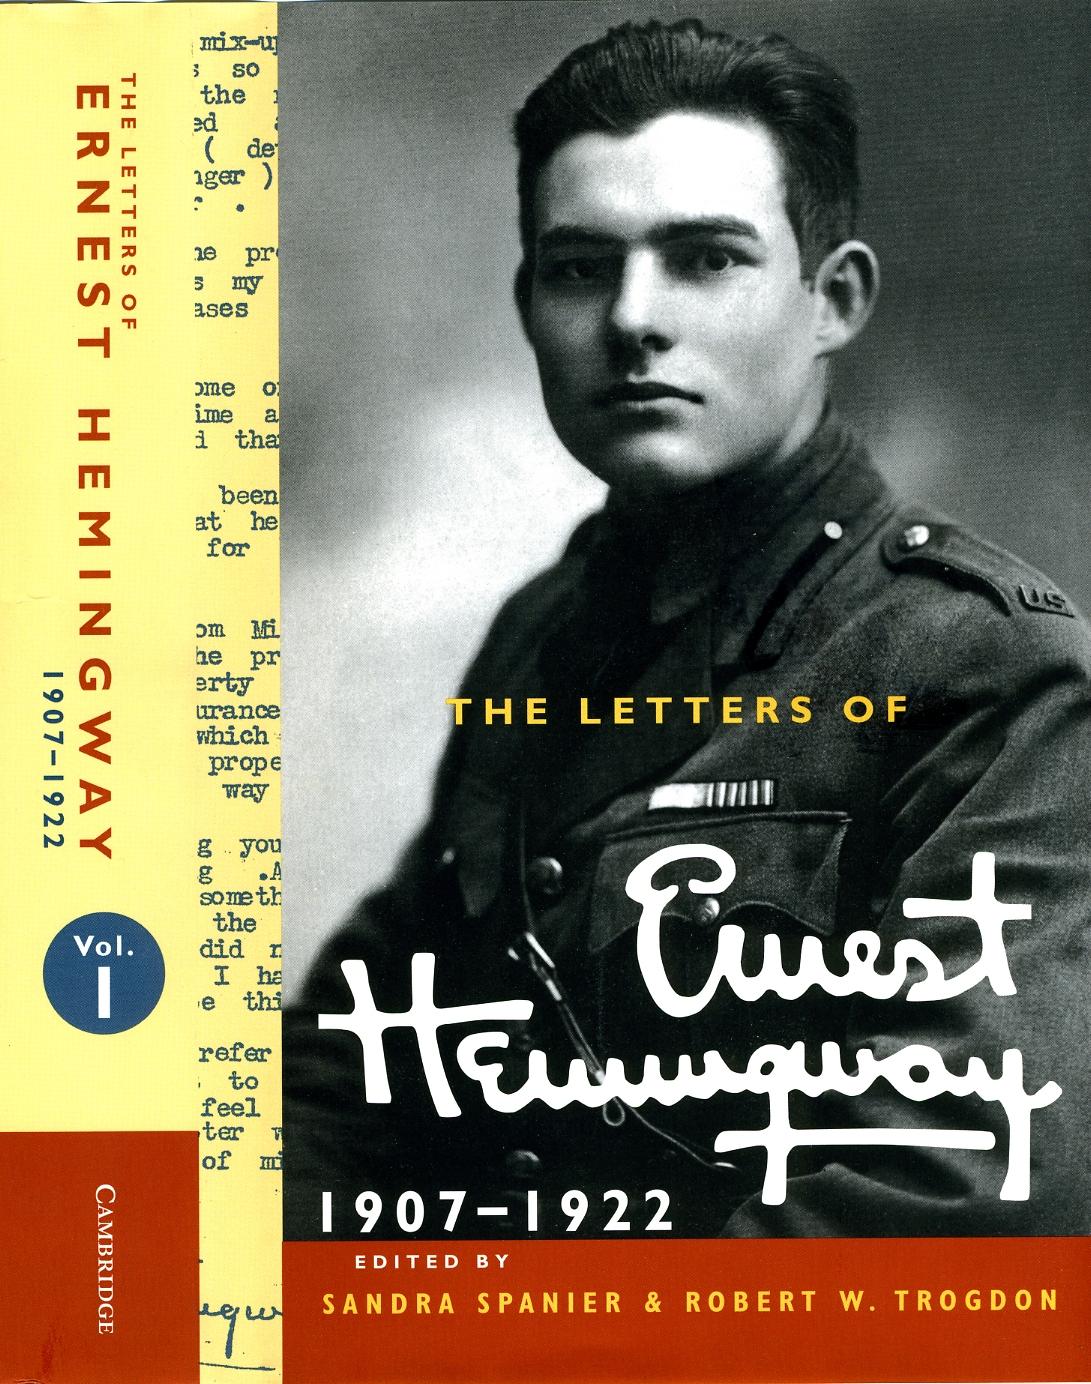 Letters of Ernest Hemingway Vol 1